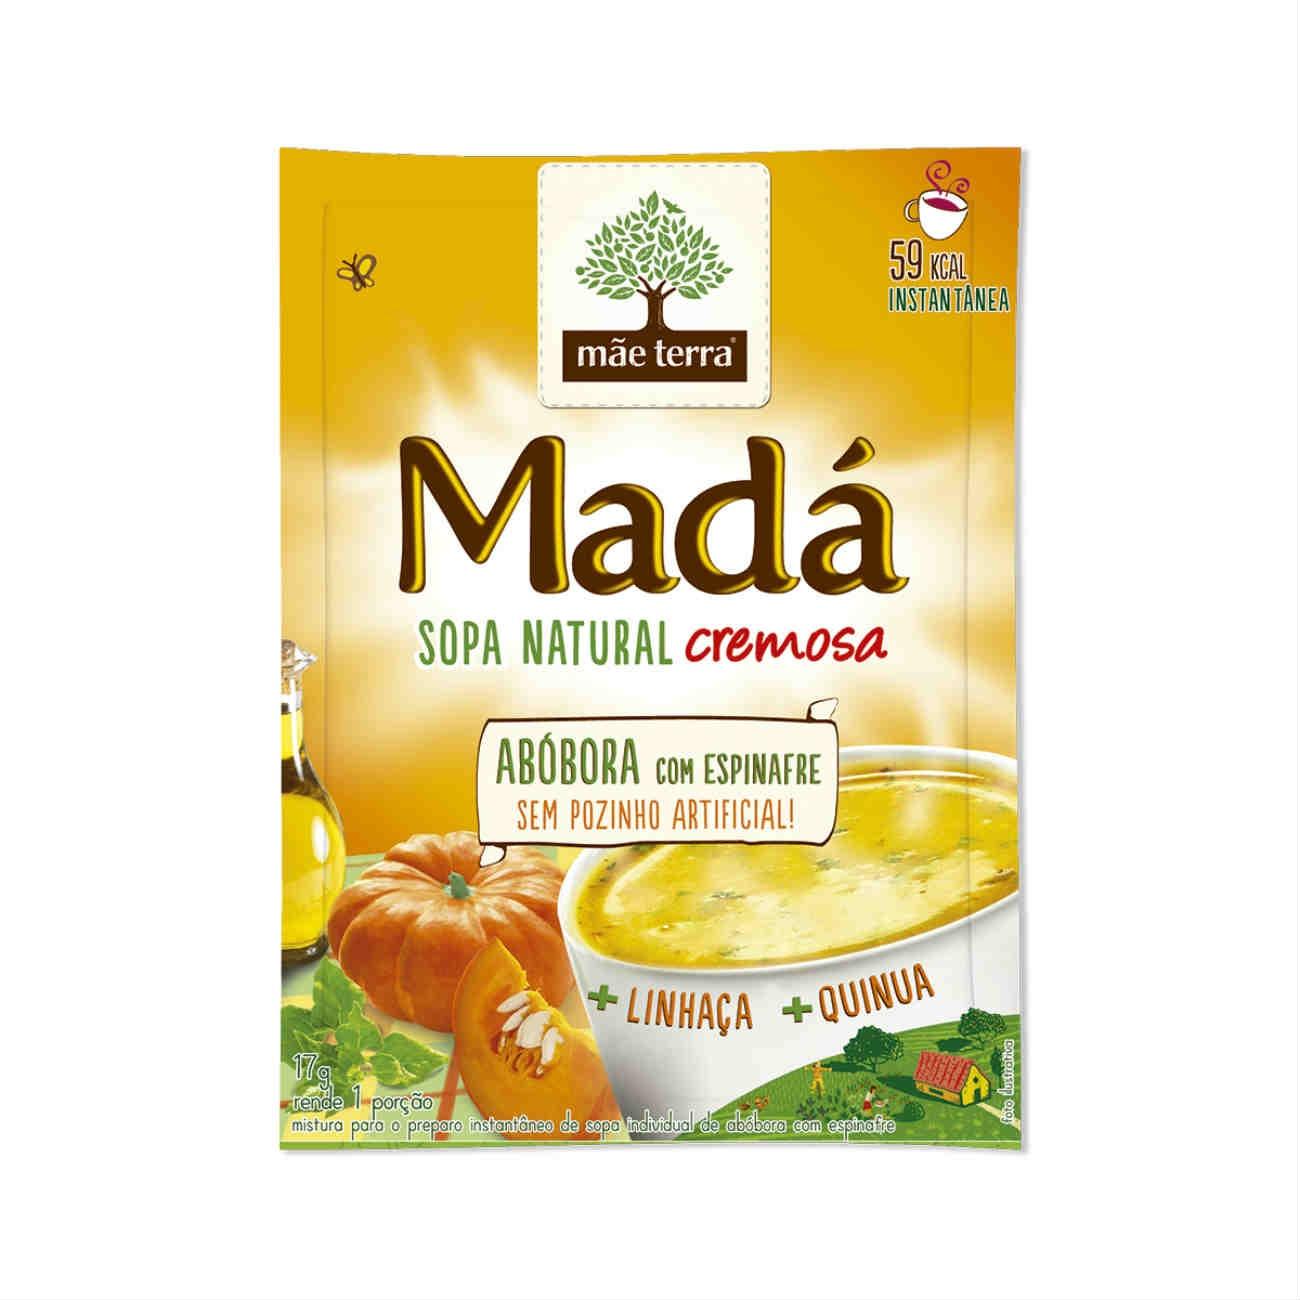 Sopa instantânea Natural Mãe Terra Madá Abóbara com Espinafre 17g | Display